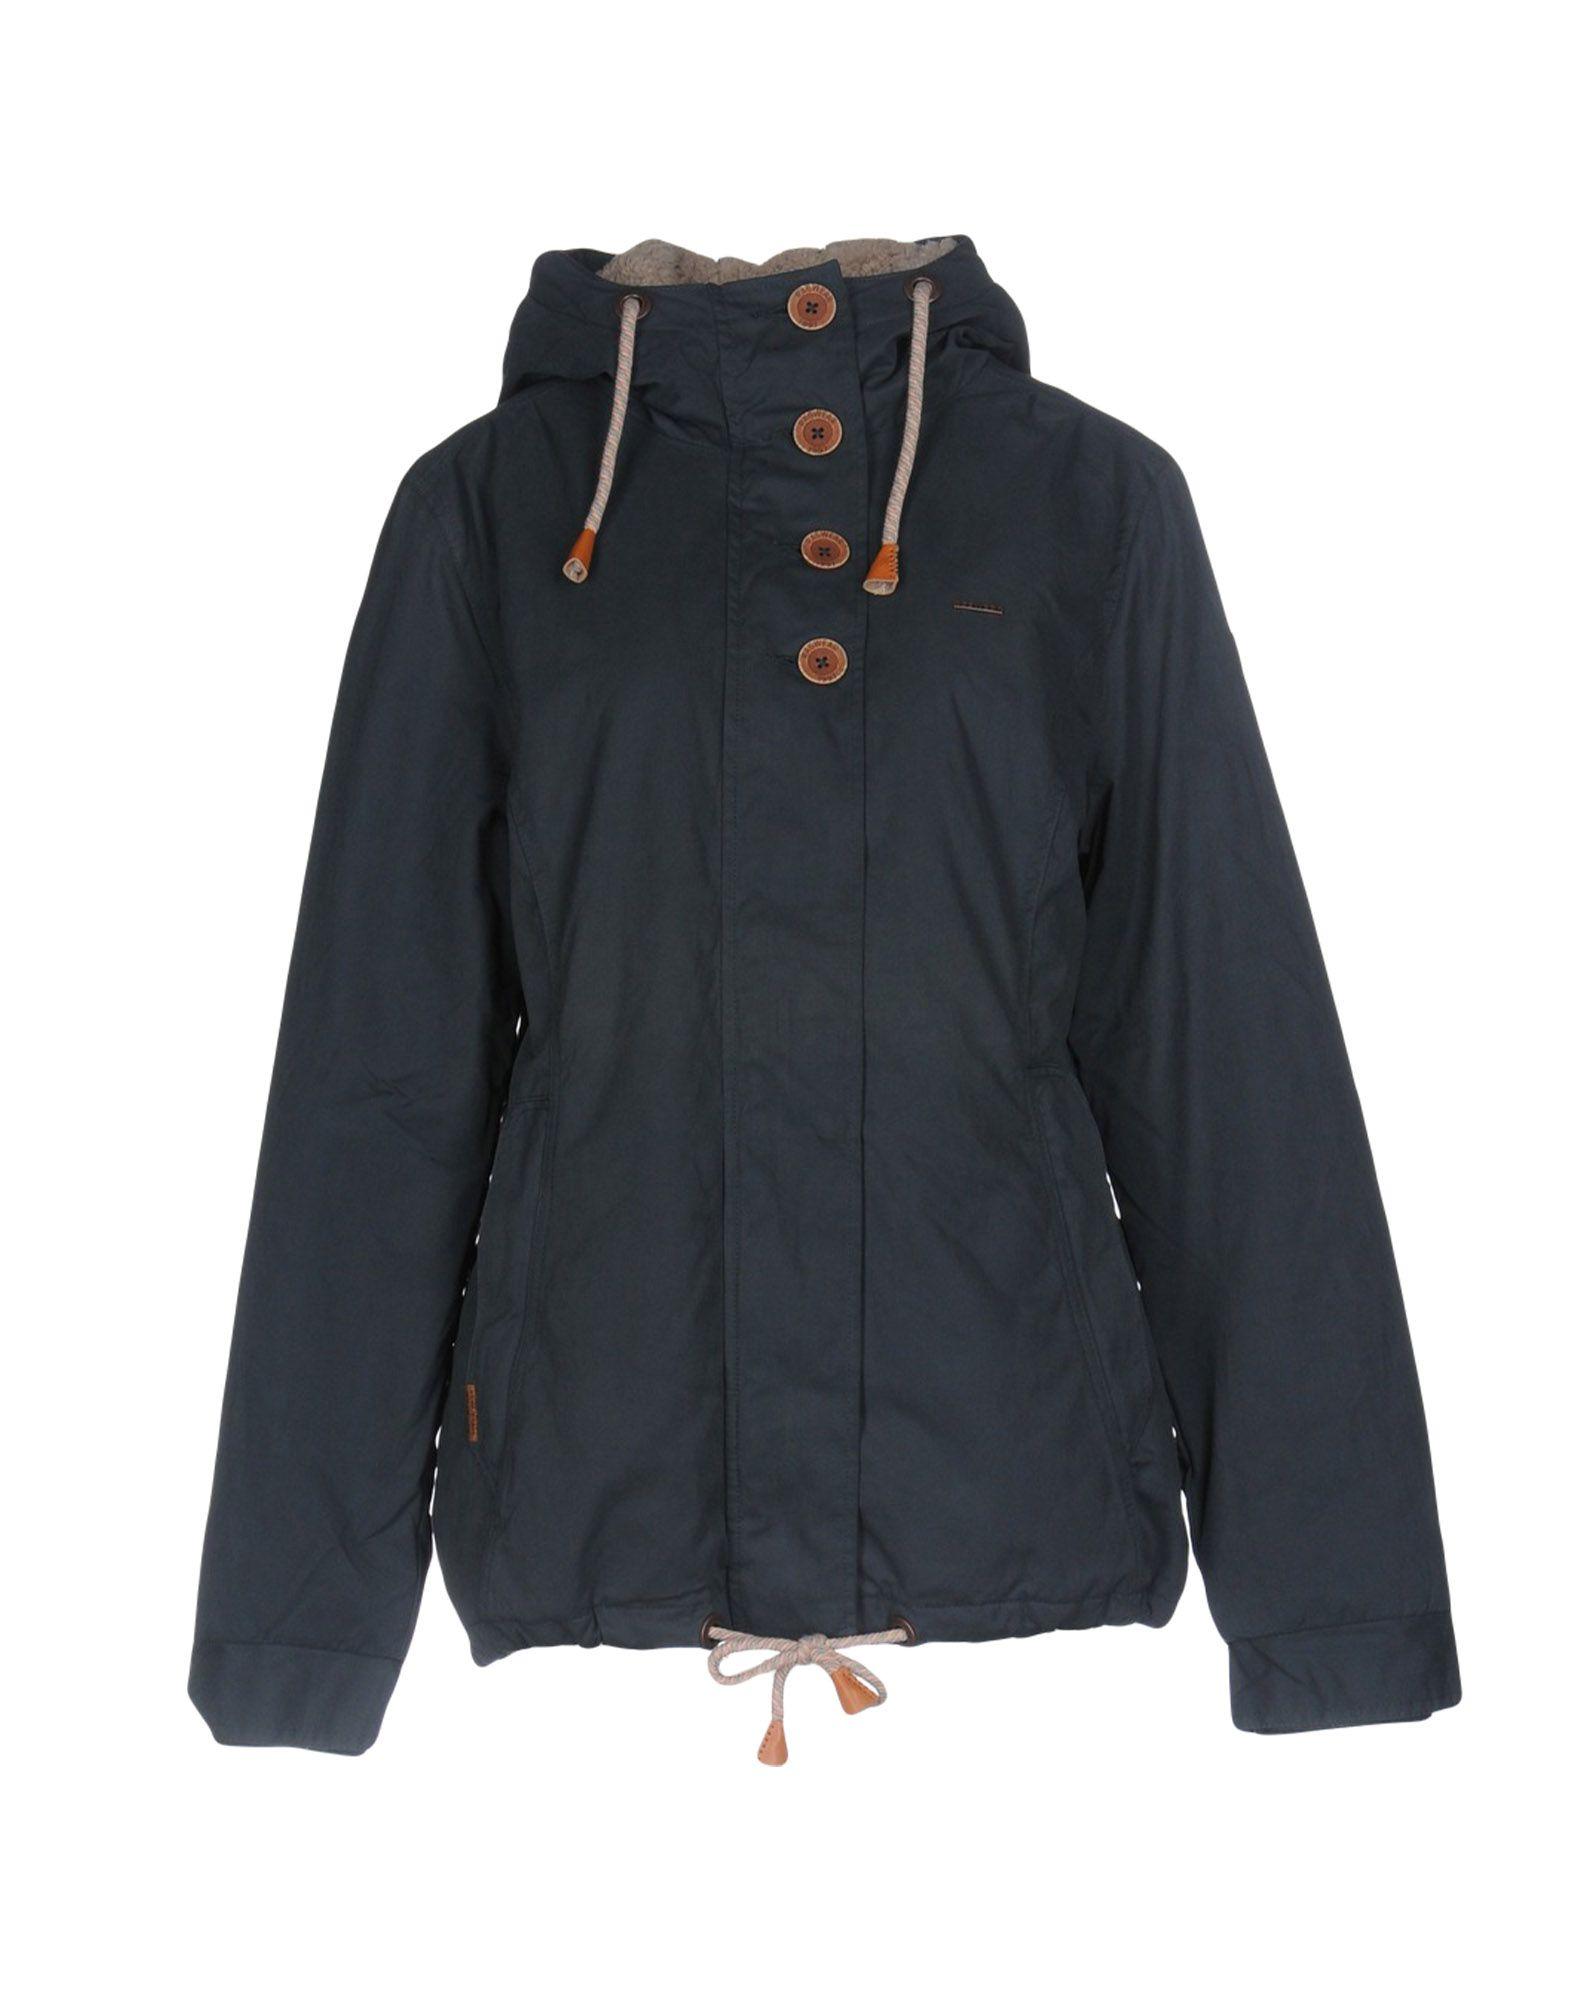 RAGWEAR Damen Jacke Farbe Taubenblau Größe 7